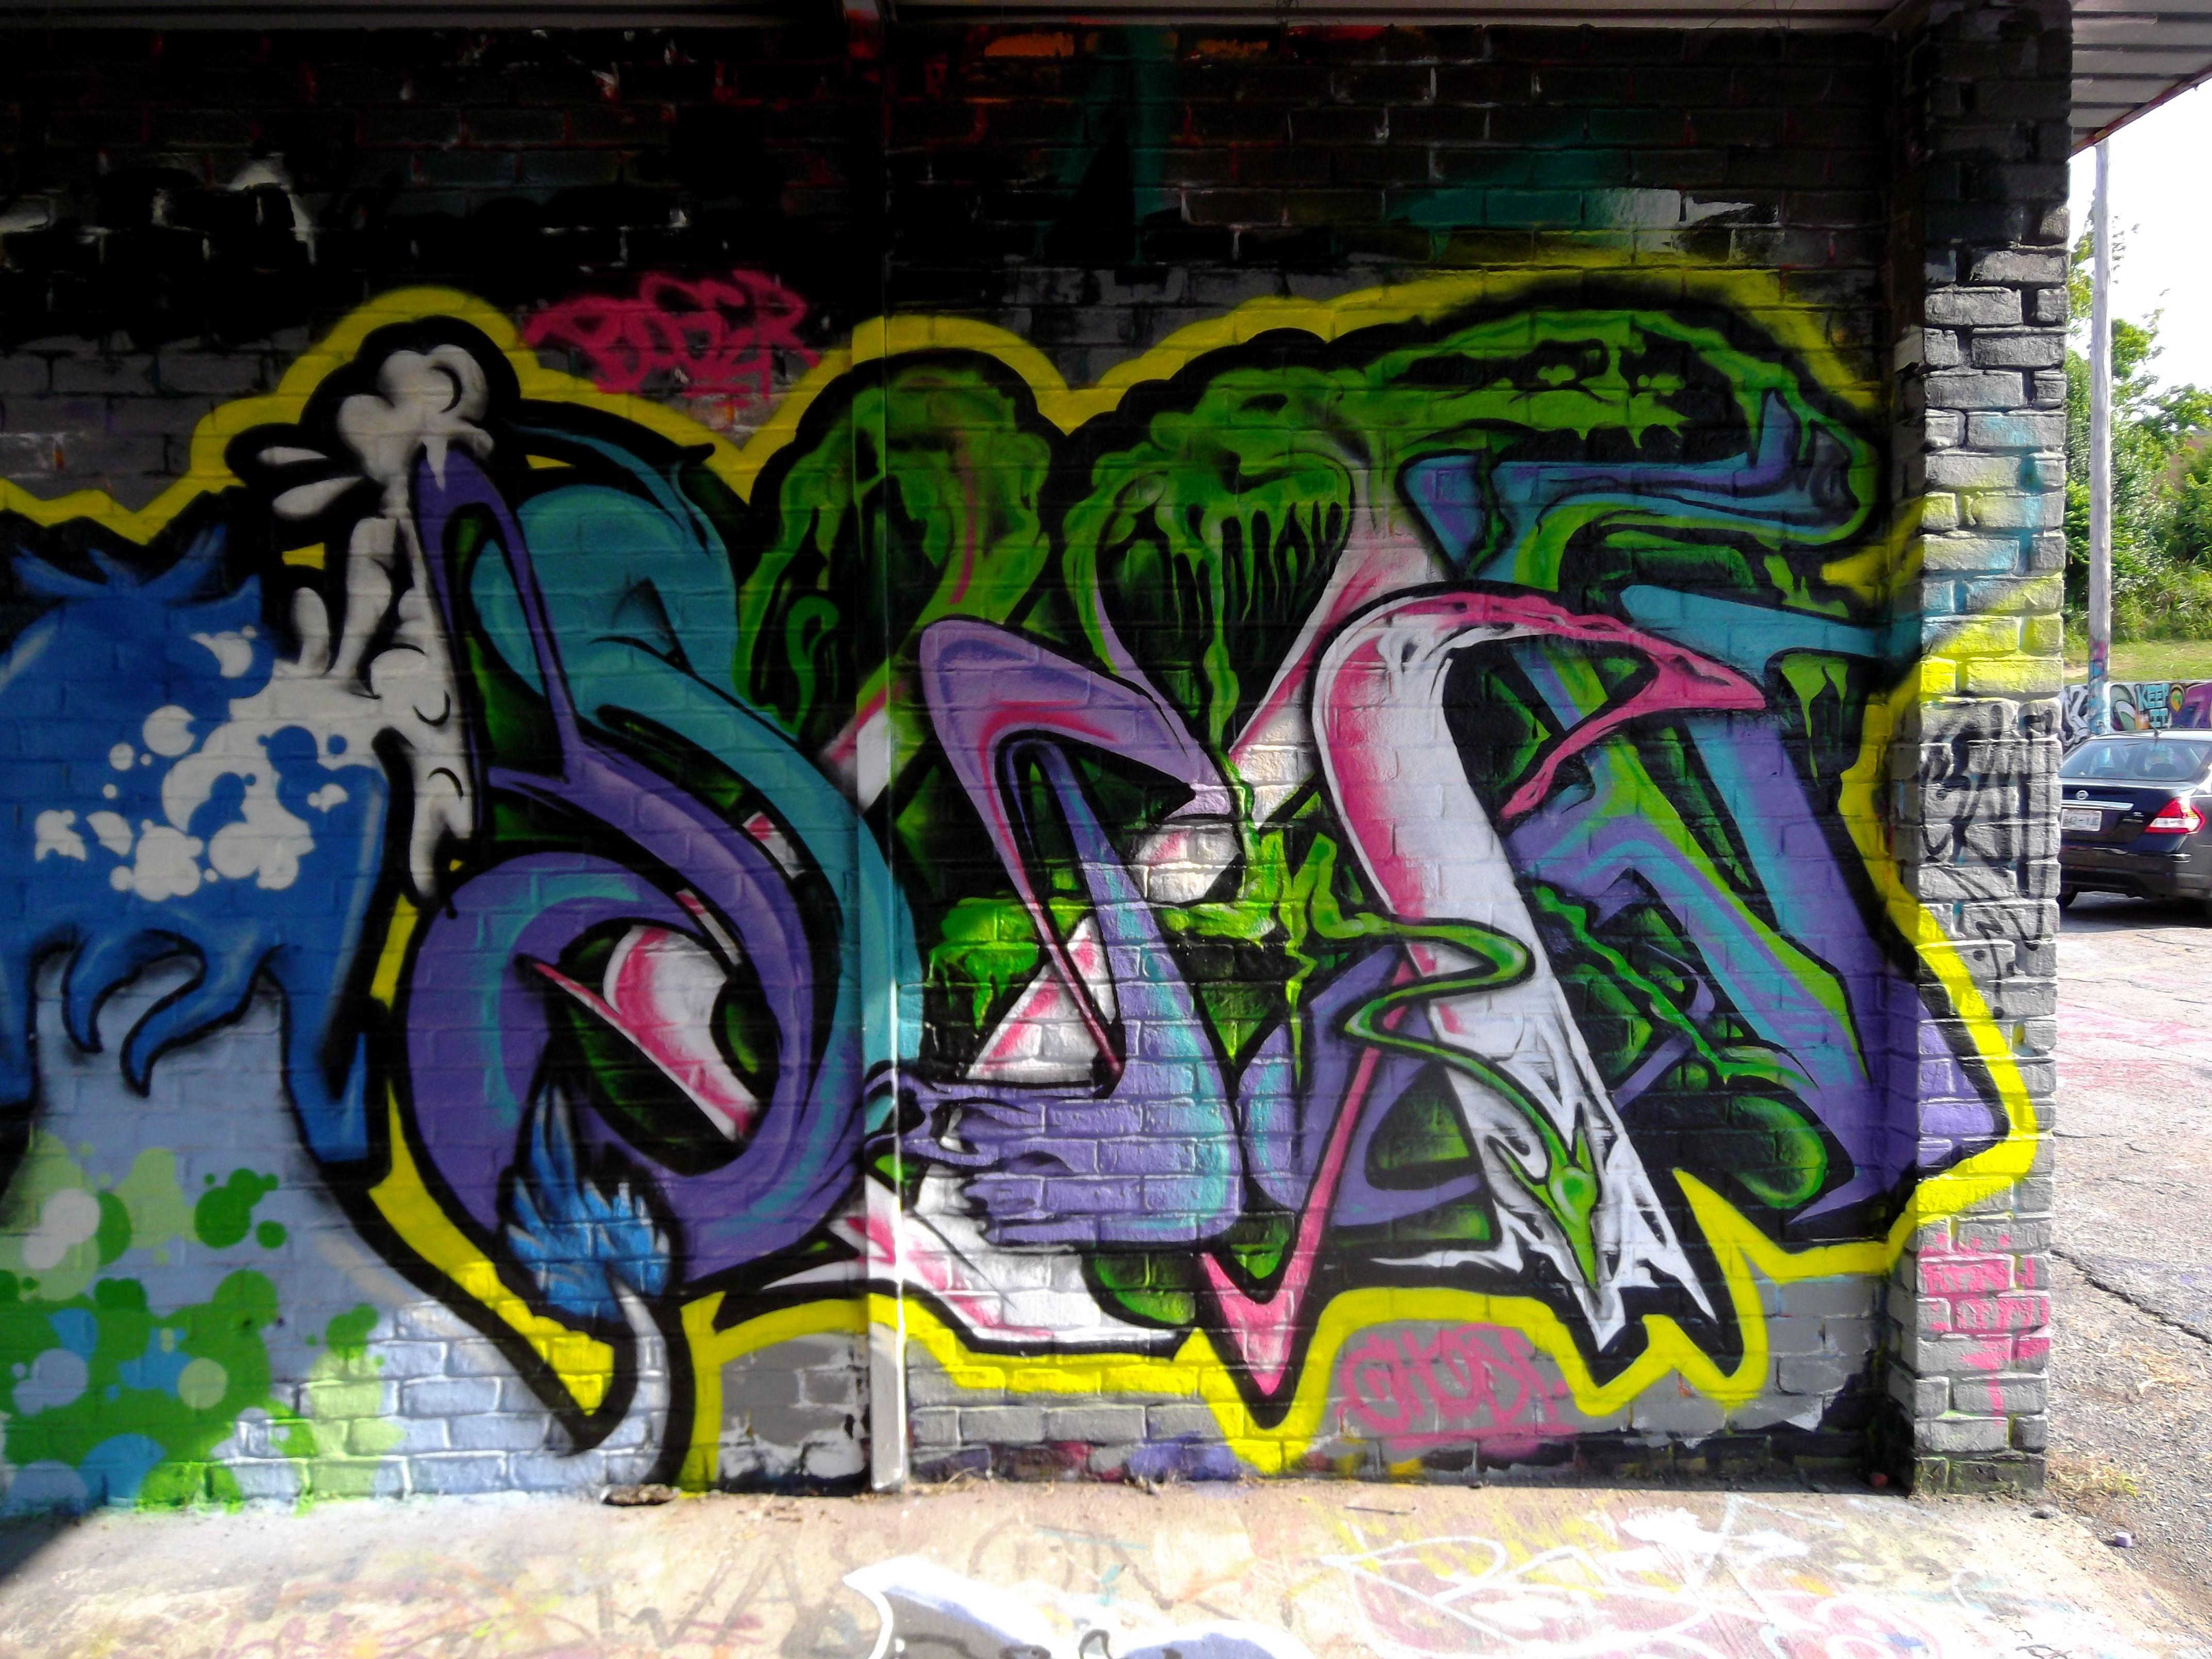 SKAN-graffiti- Nashville TN- washyard paint jam 2013